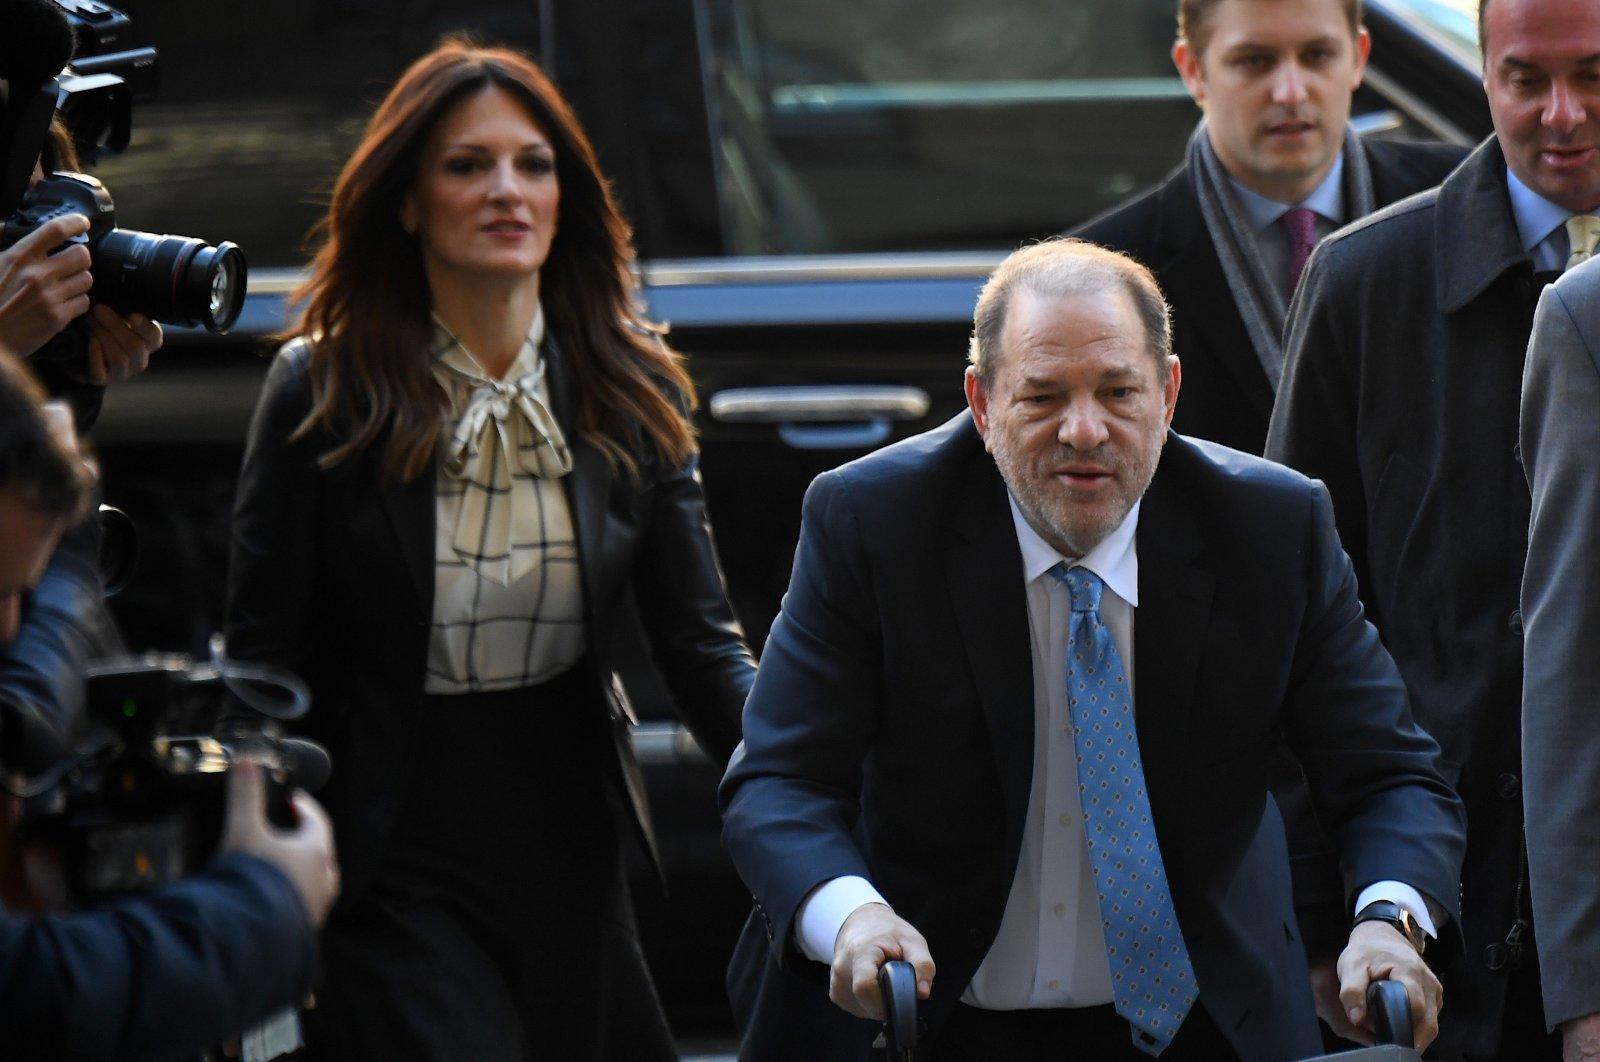 Harvey Weinstein arrives at the Manhattan Criminal Court, New York City, Feb. 24, 2020. (AFP Photo)